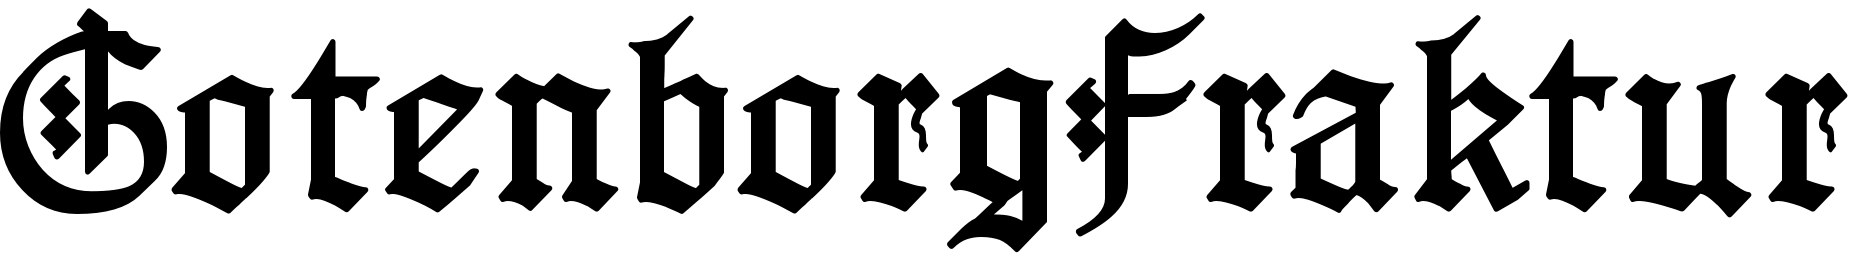 GotenborgFraktur